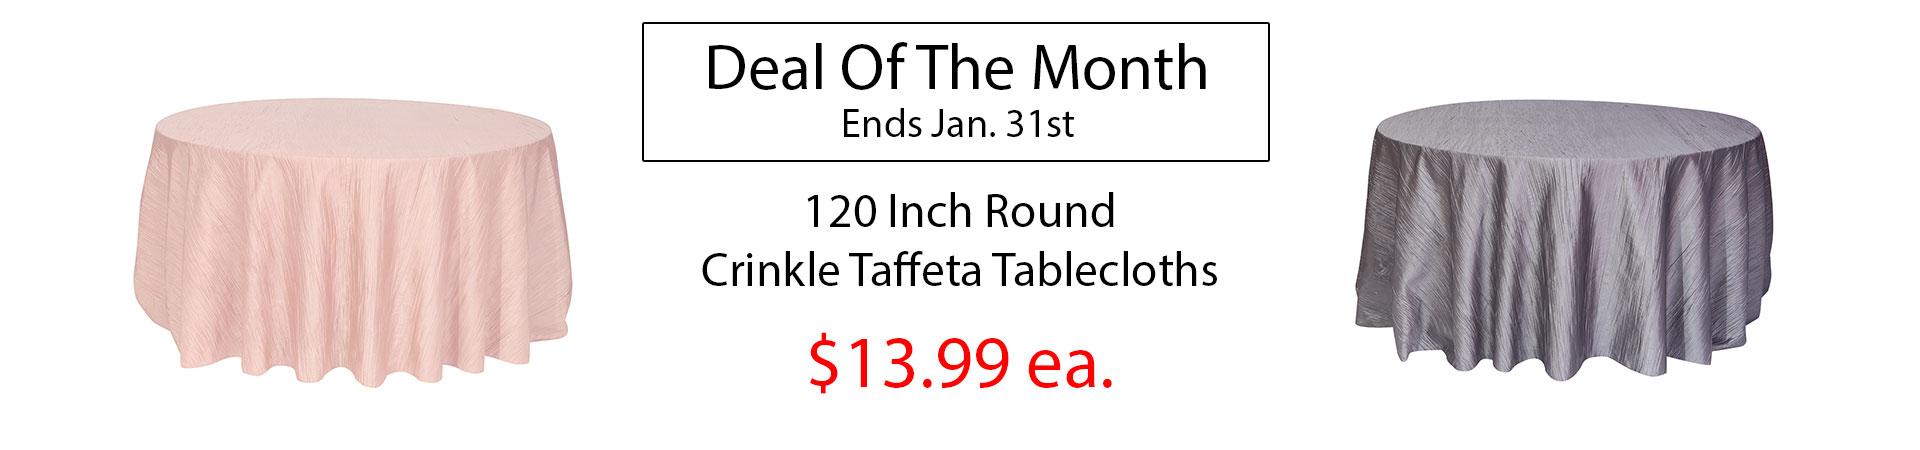 crinkle tablecloths